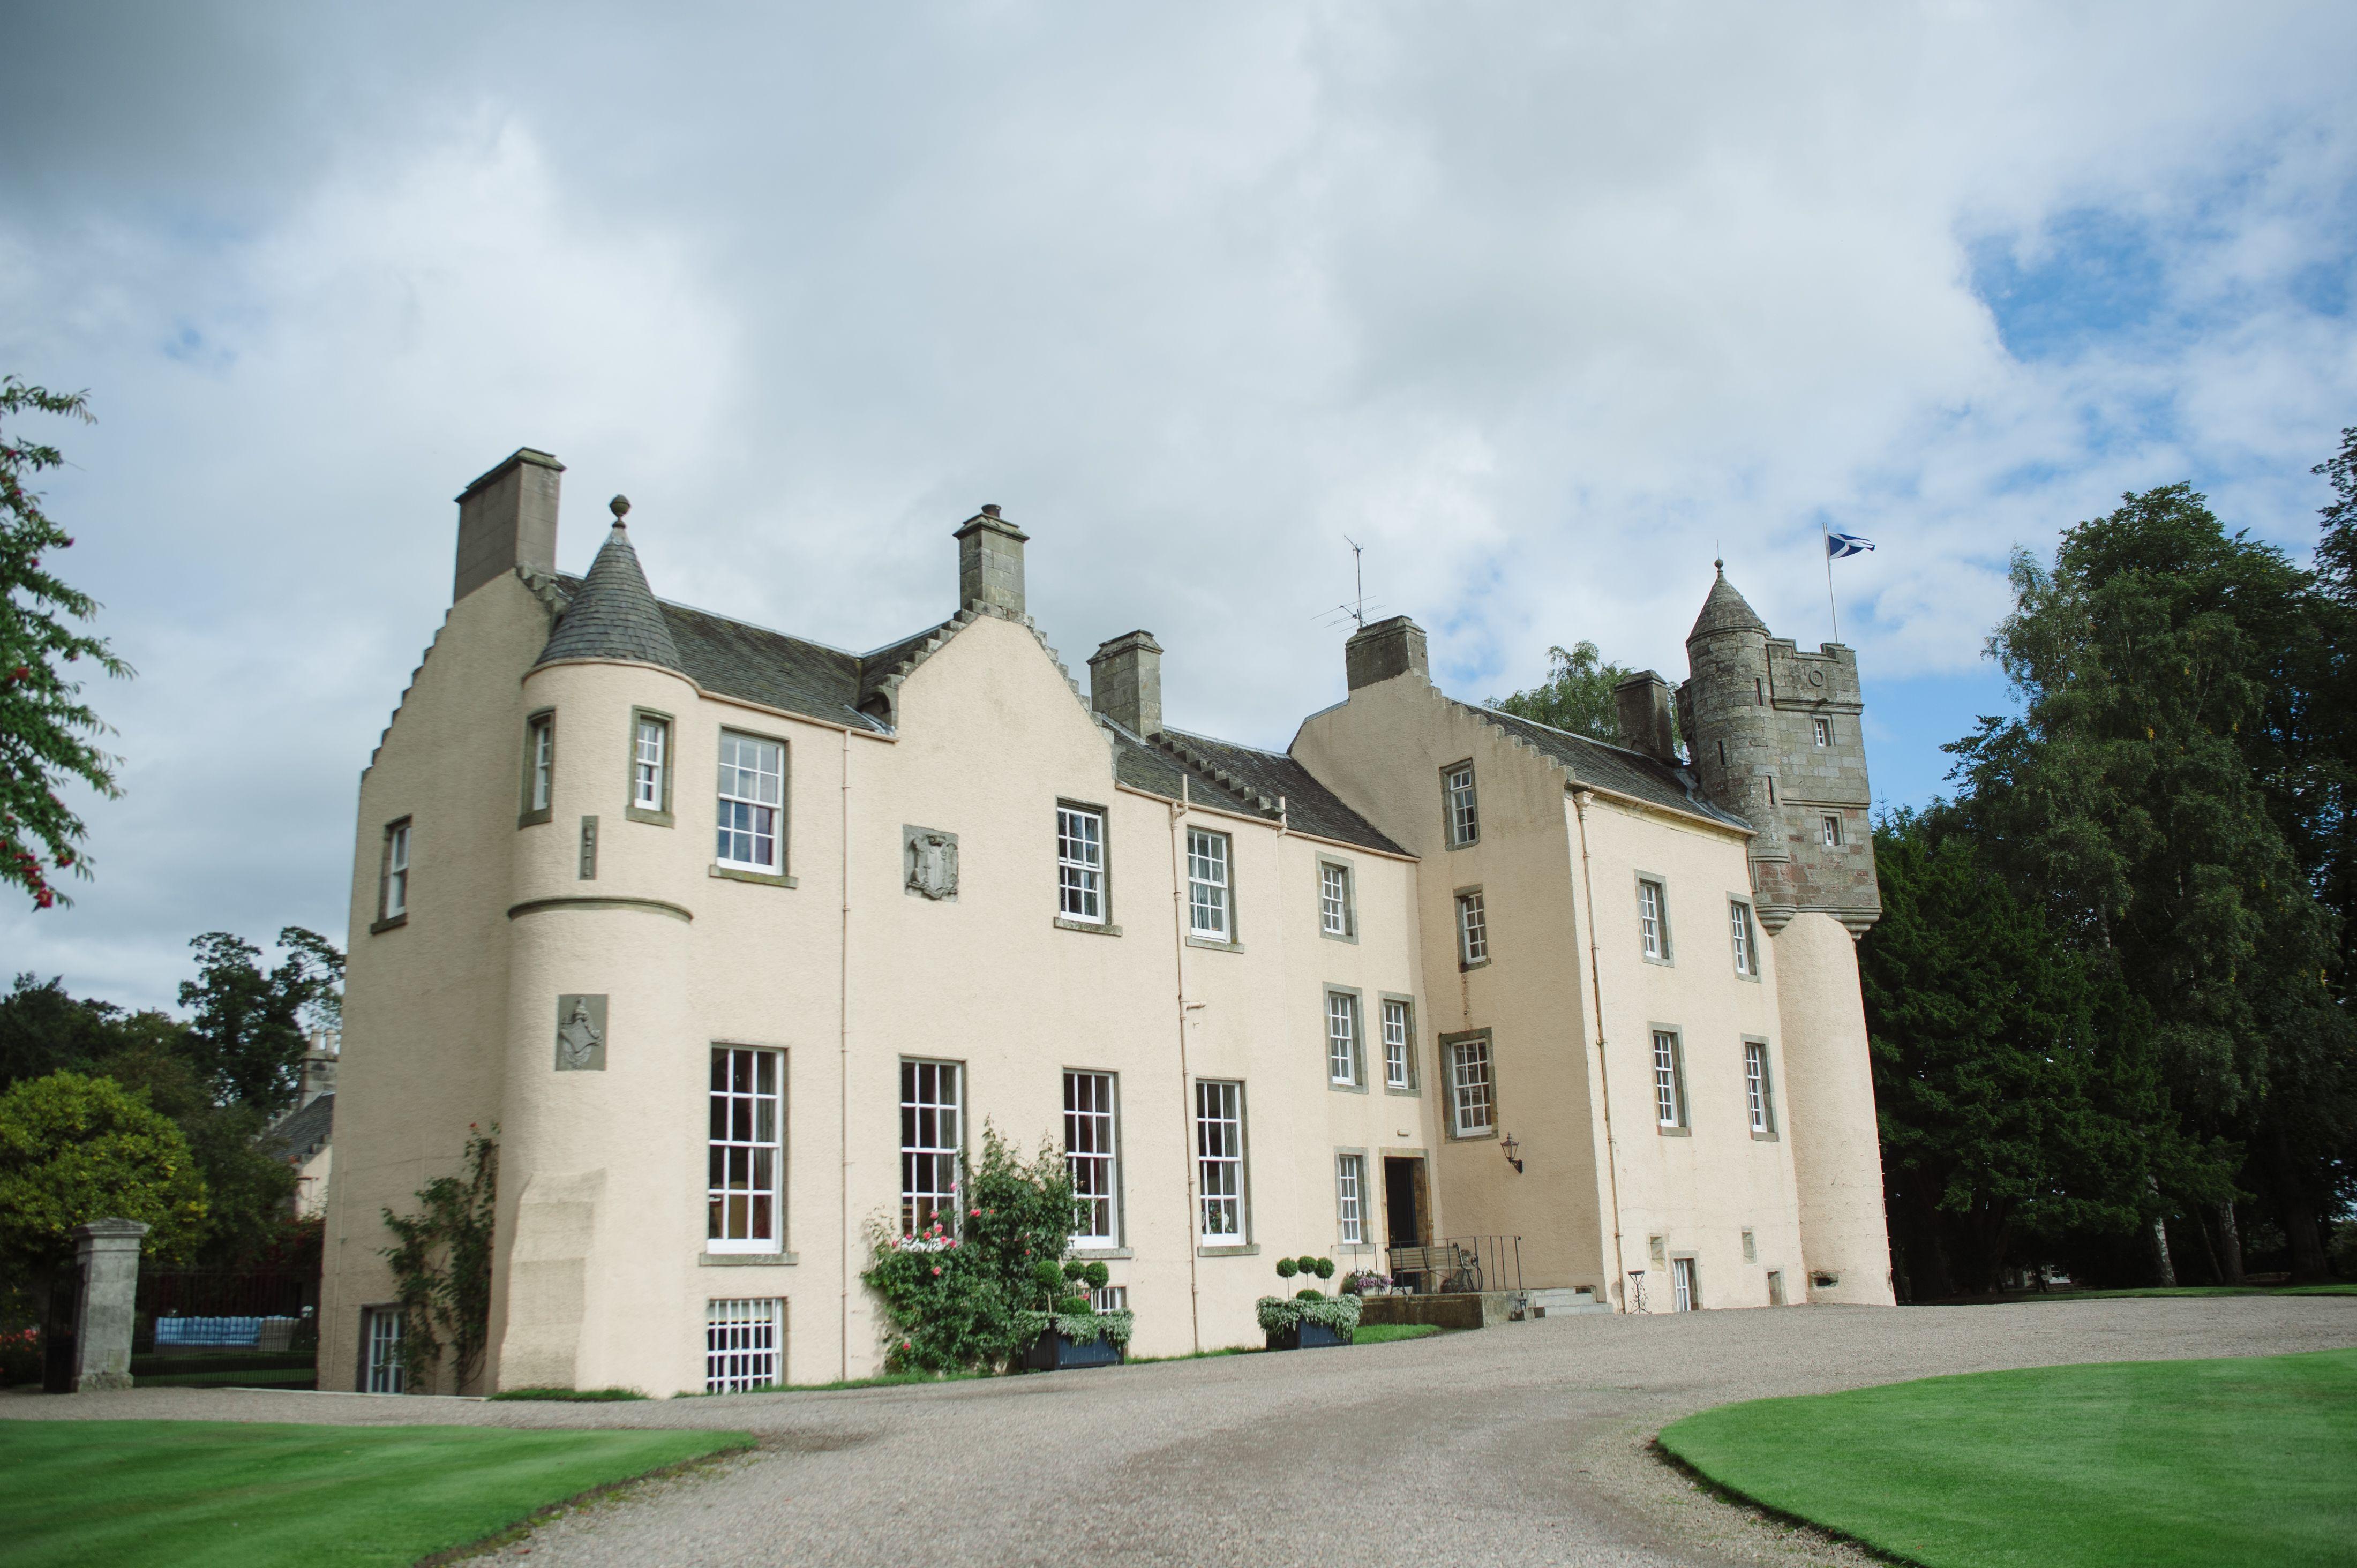 Myres Castle Has Just Been Named The Uks Best Historic Wedding Venue